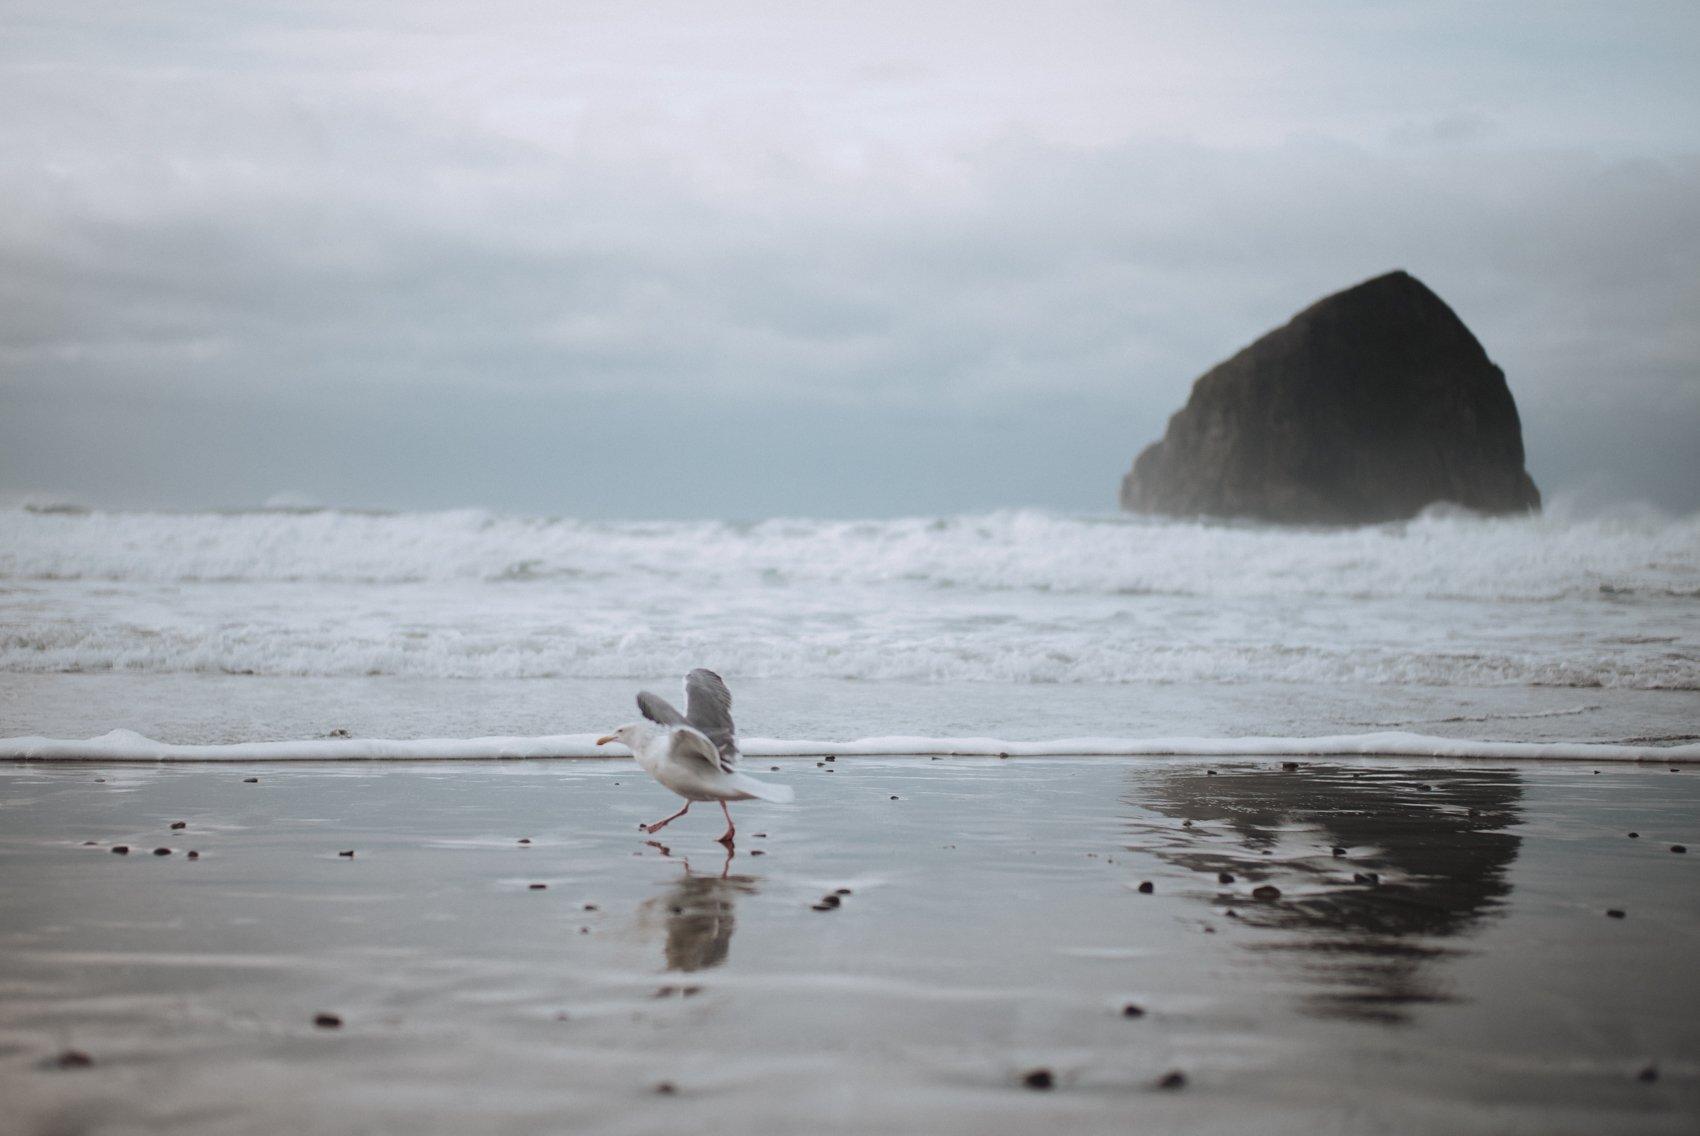 oregon coast photos nature inspiration elopement destination pacific northwest is beautiful